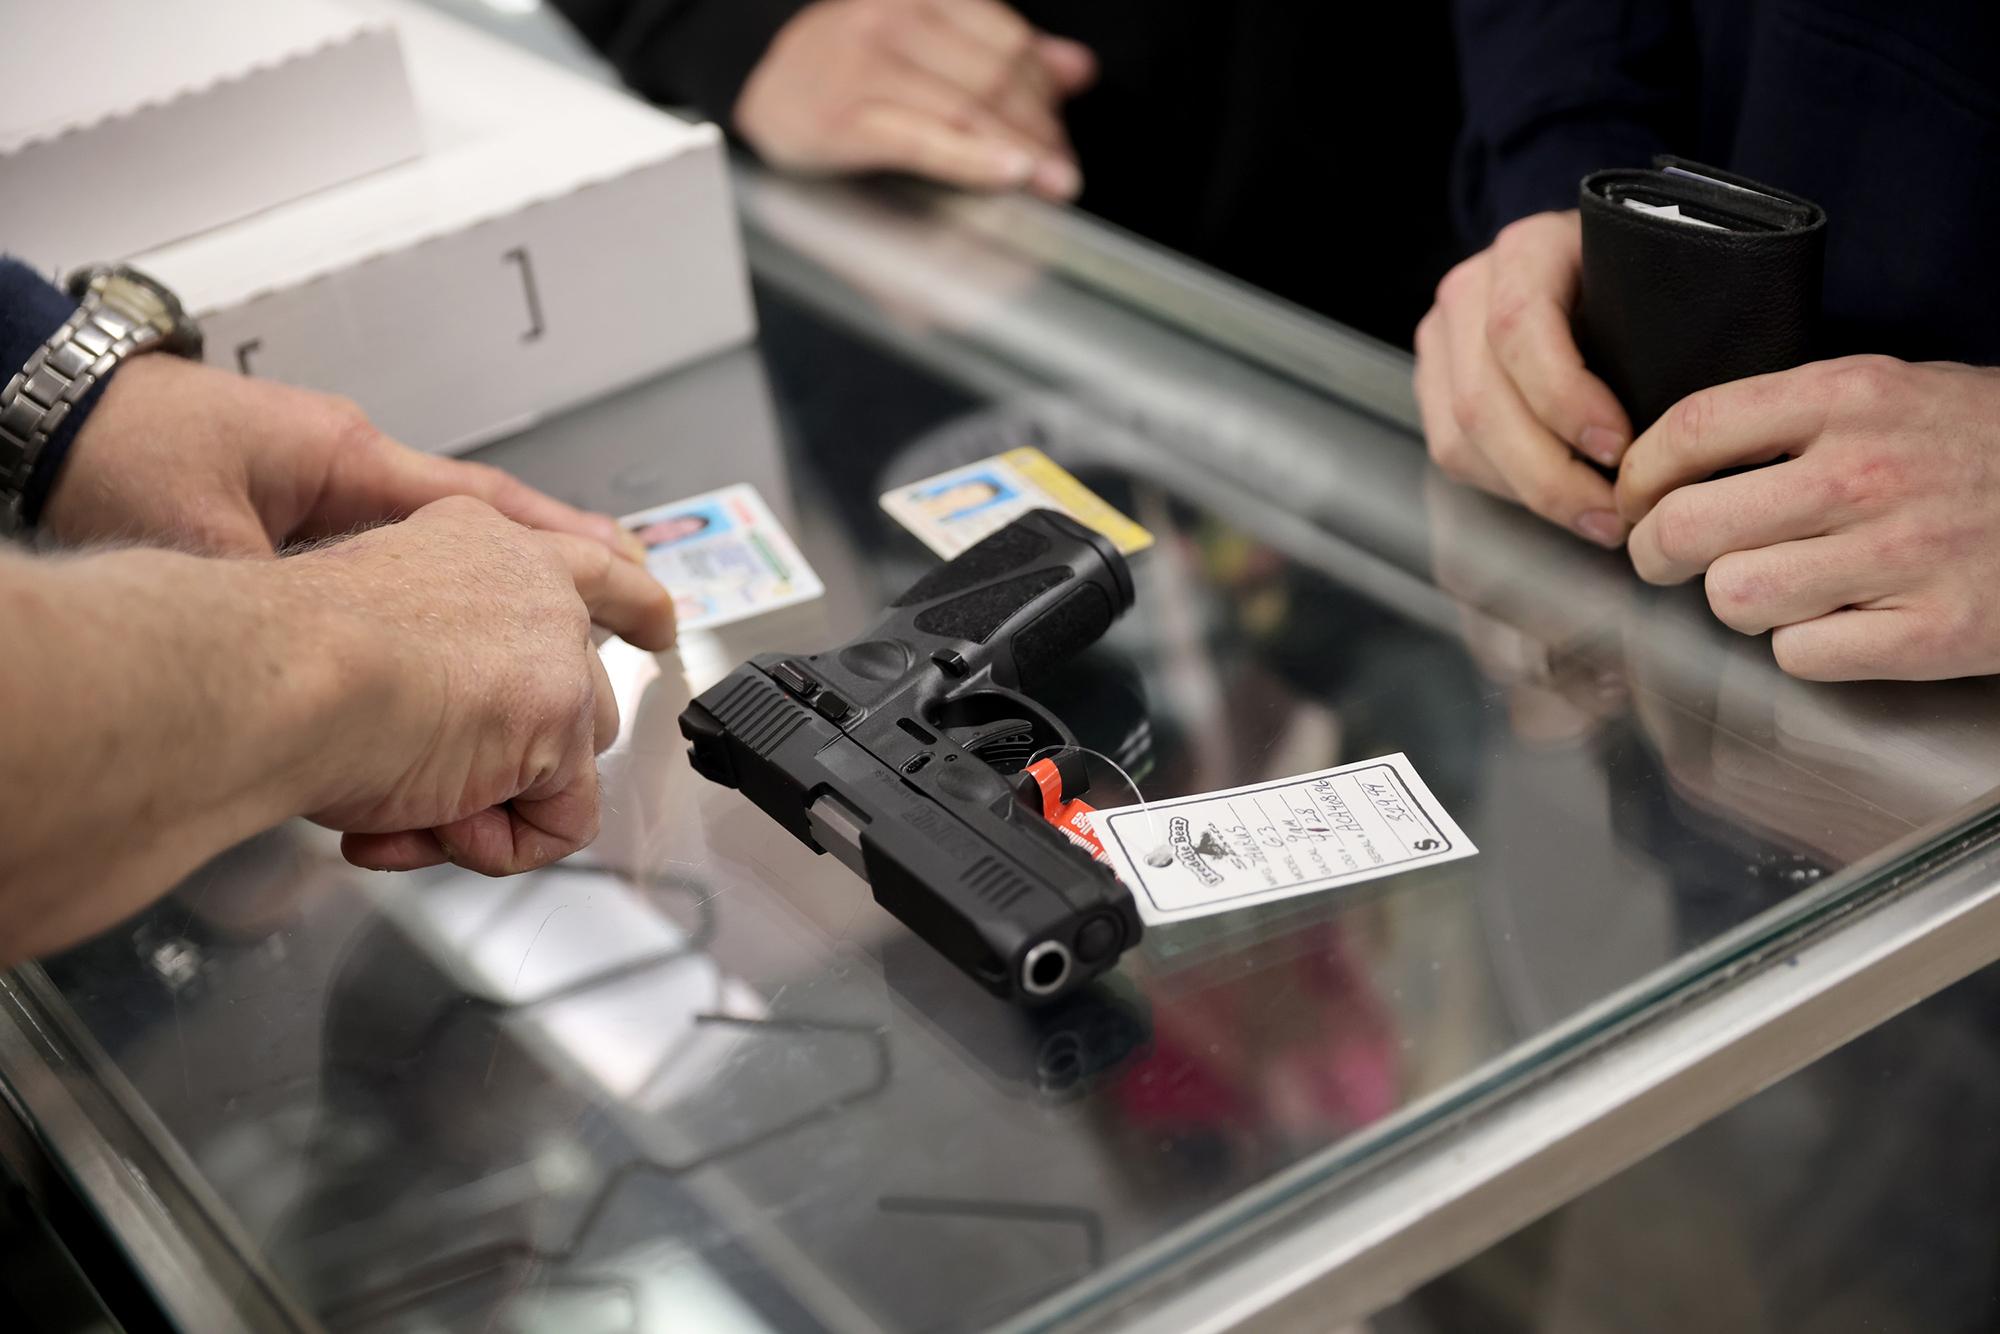 Gun background checks soared in April